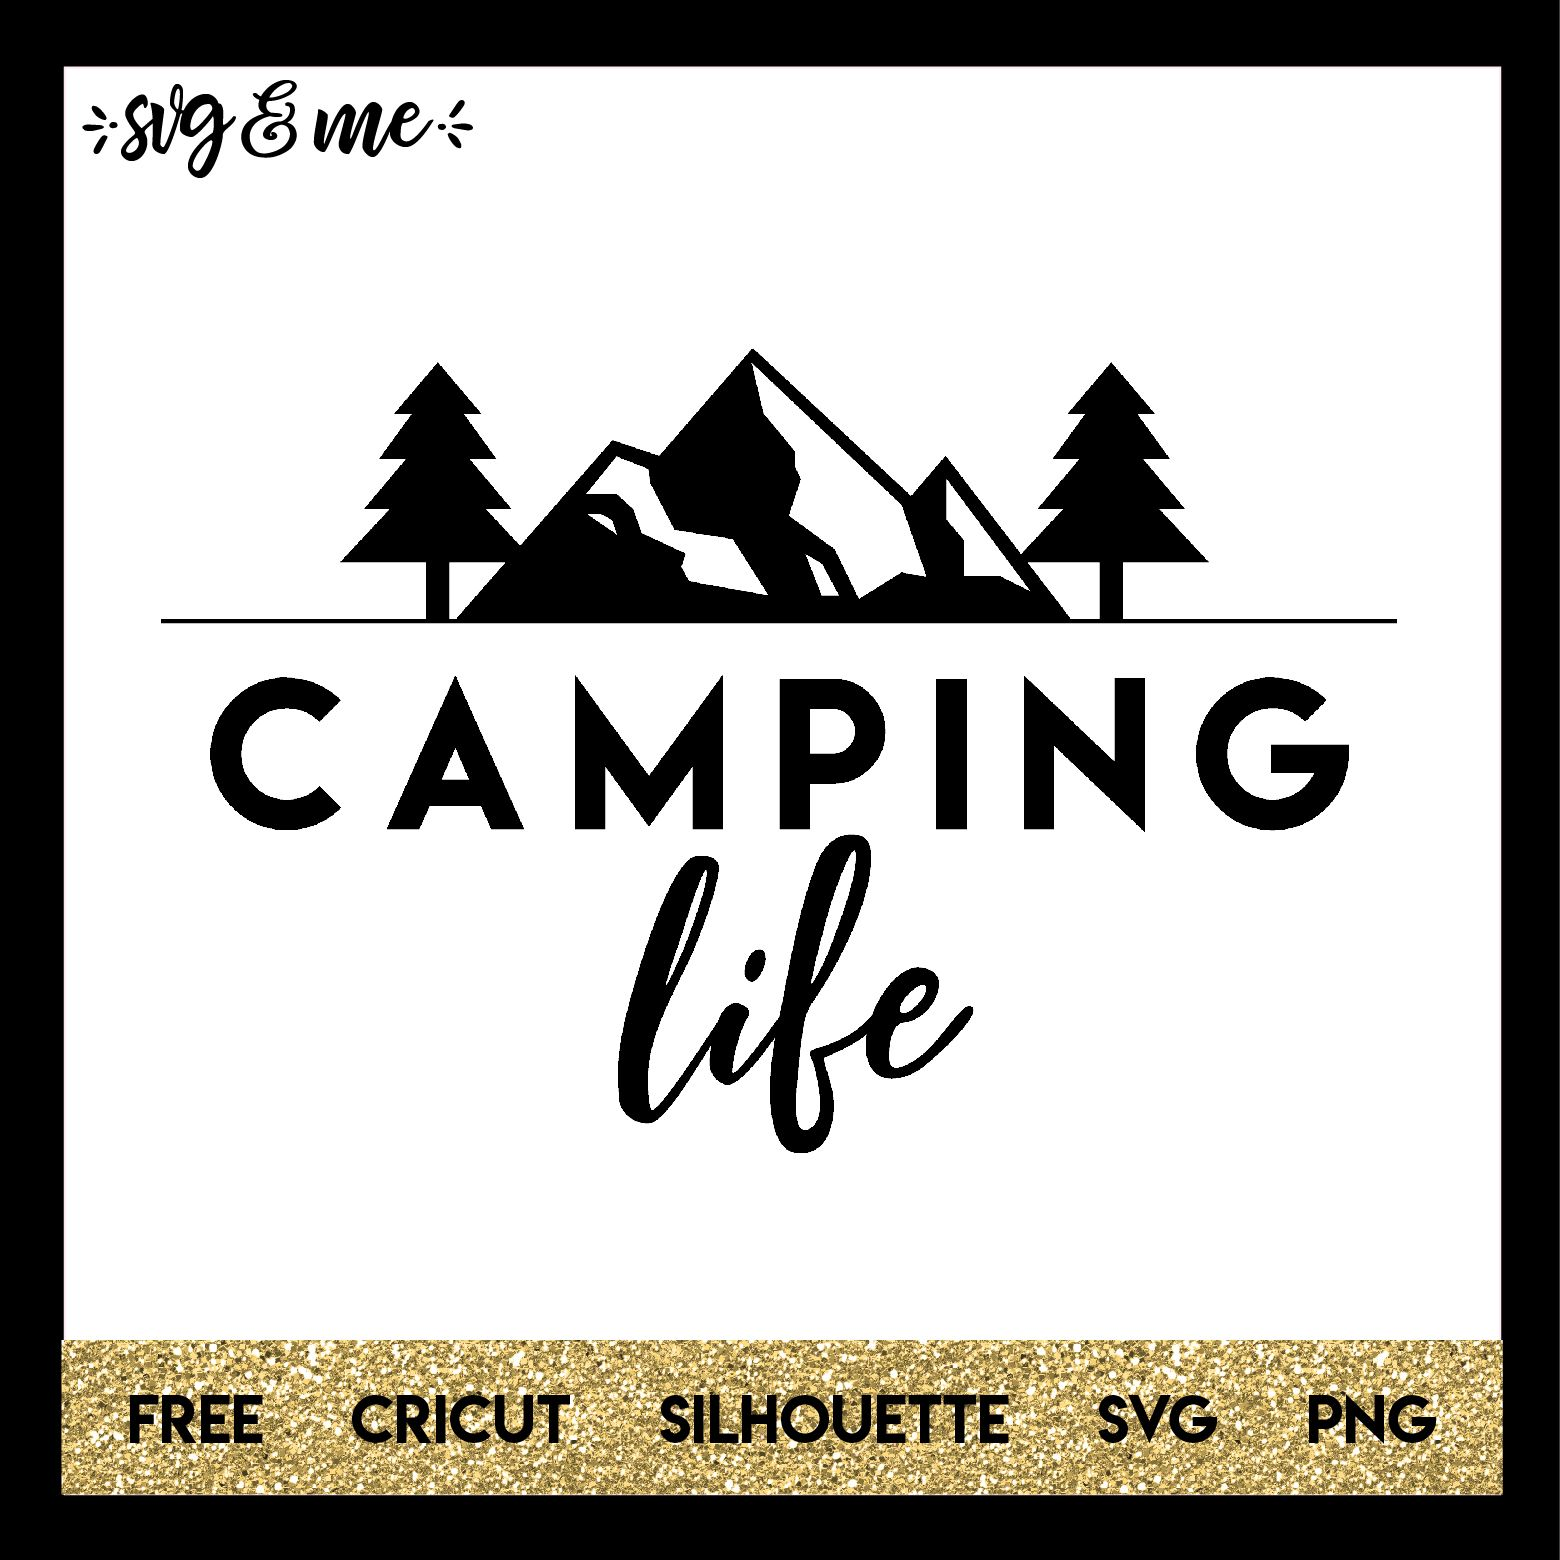 Camping Life Cricut Camping Life Svg Files For Cricut